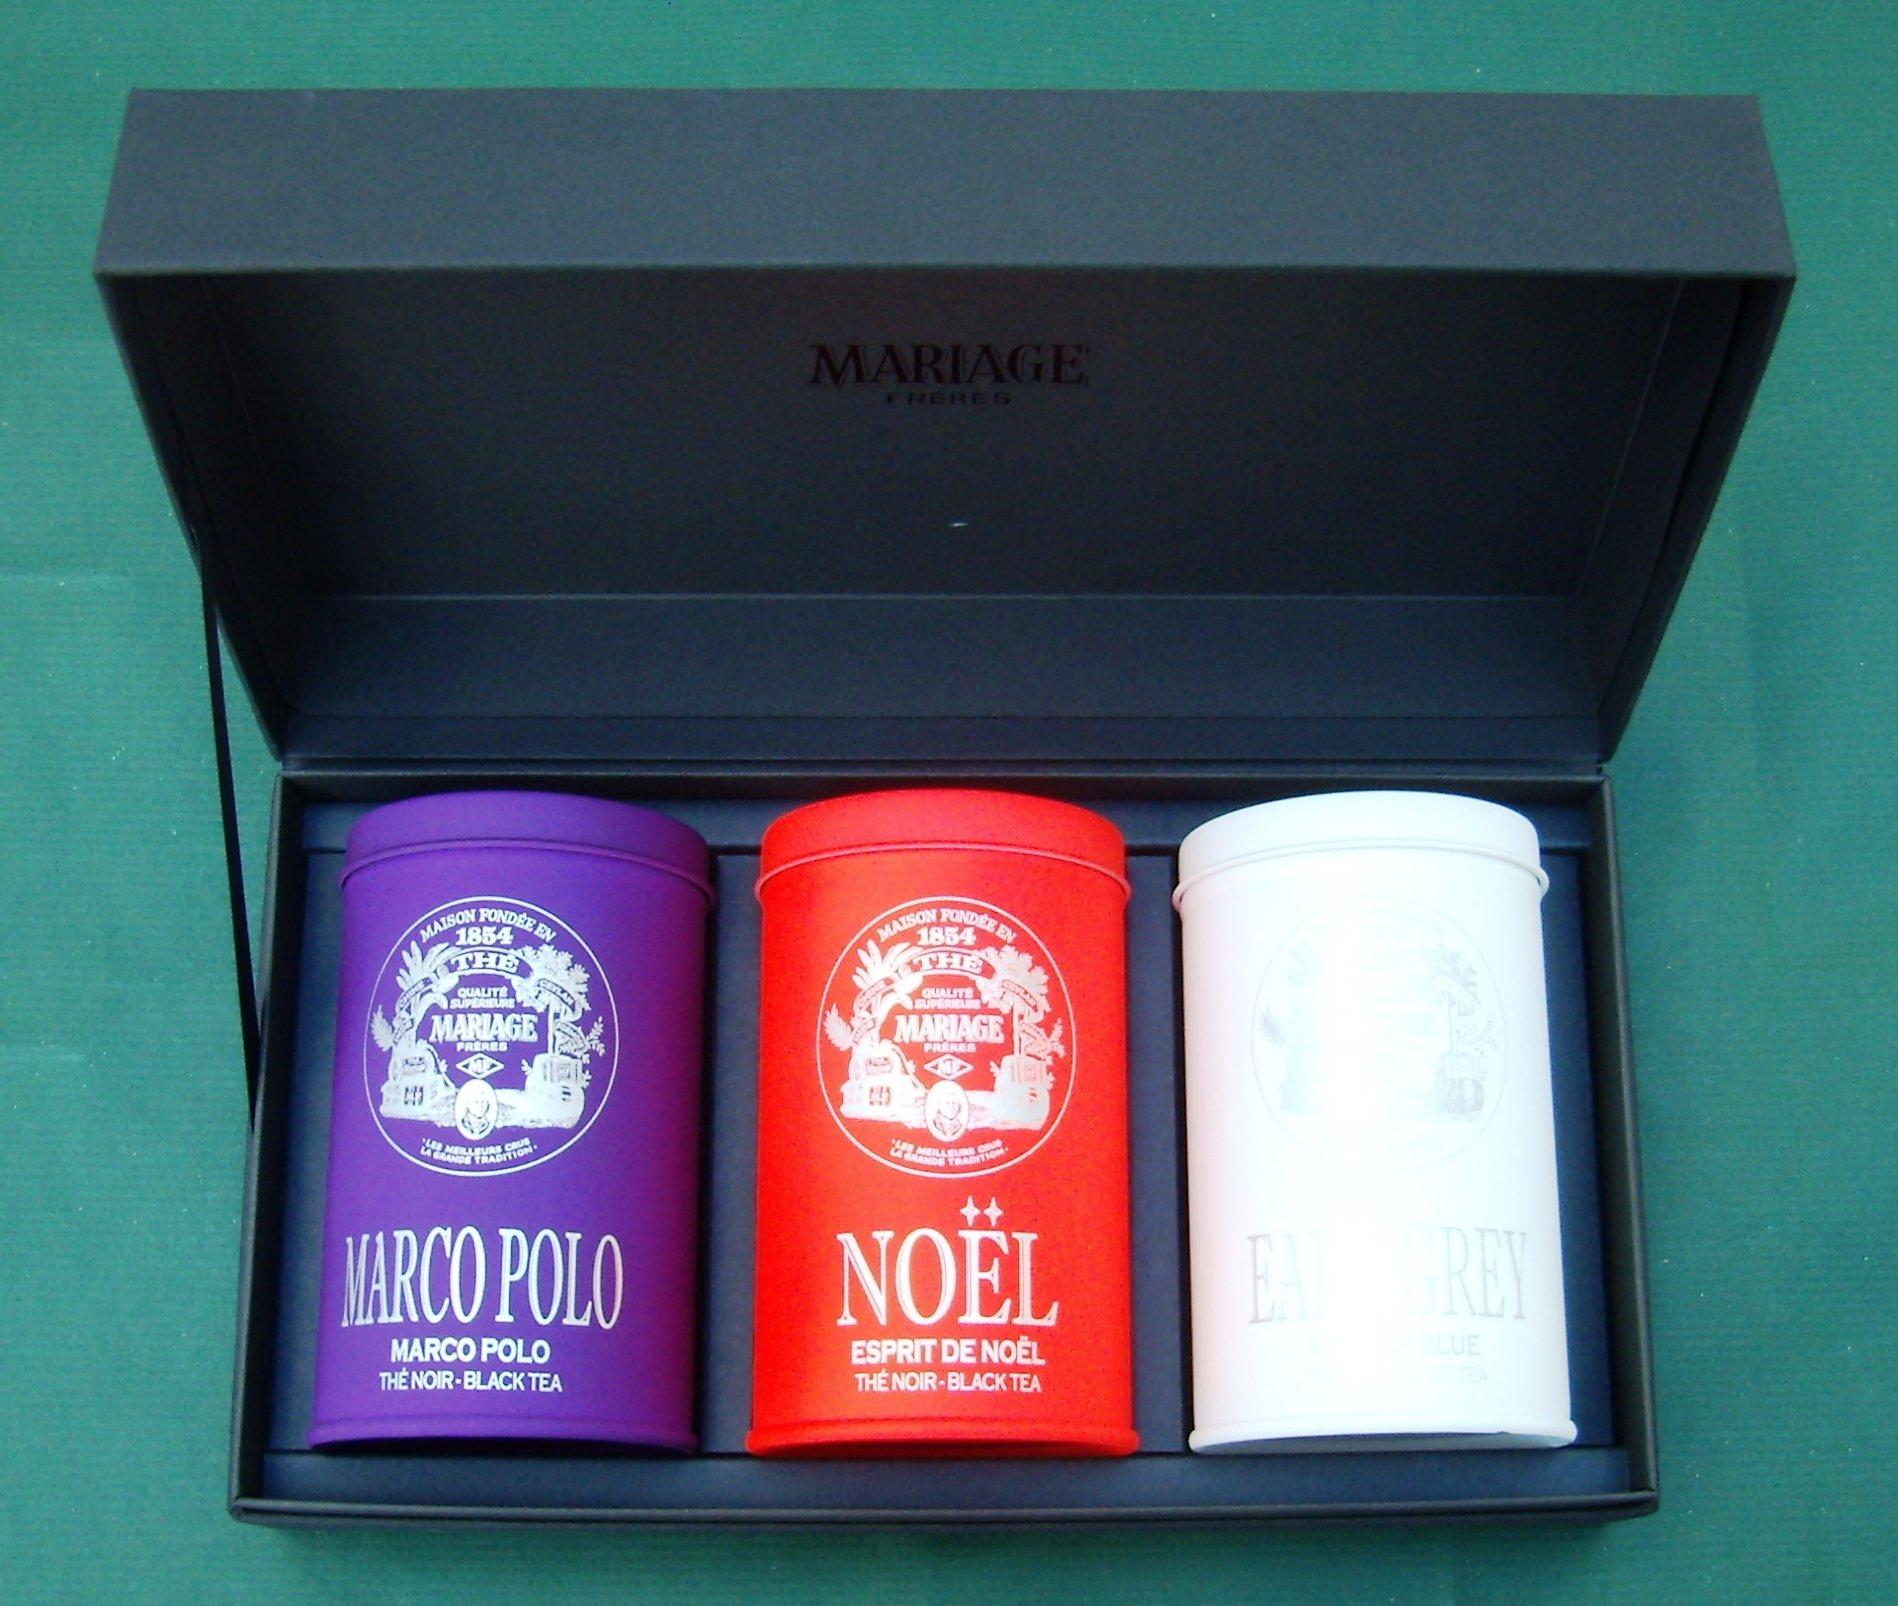 Mariage Frères - MASTERPIECE® - 3 Teas gift set - EACH: 3.52oz / 100gr canister / tin